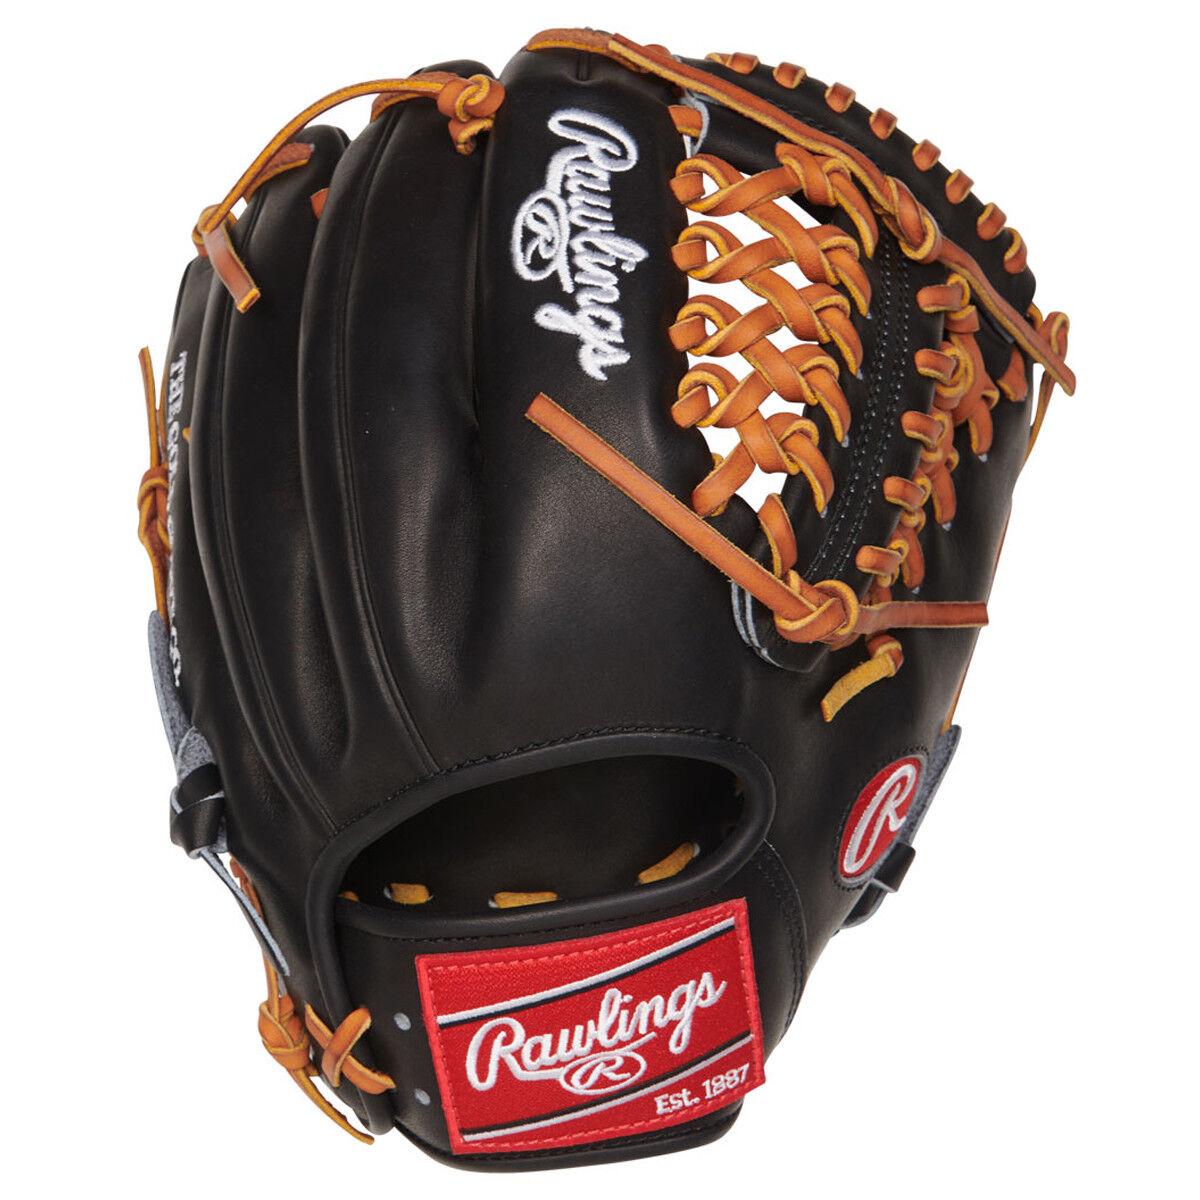 Rawlings Heart of the Baseball Hide 11.5